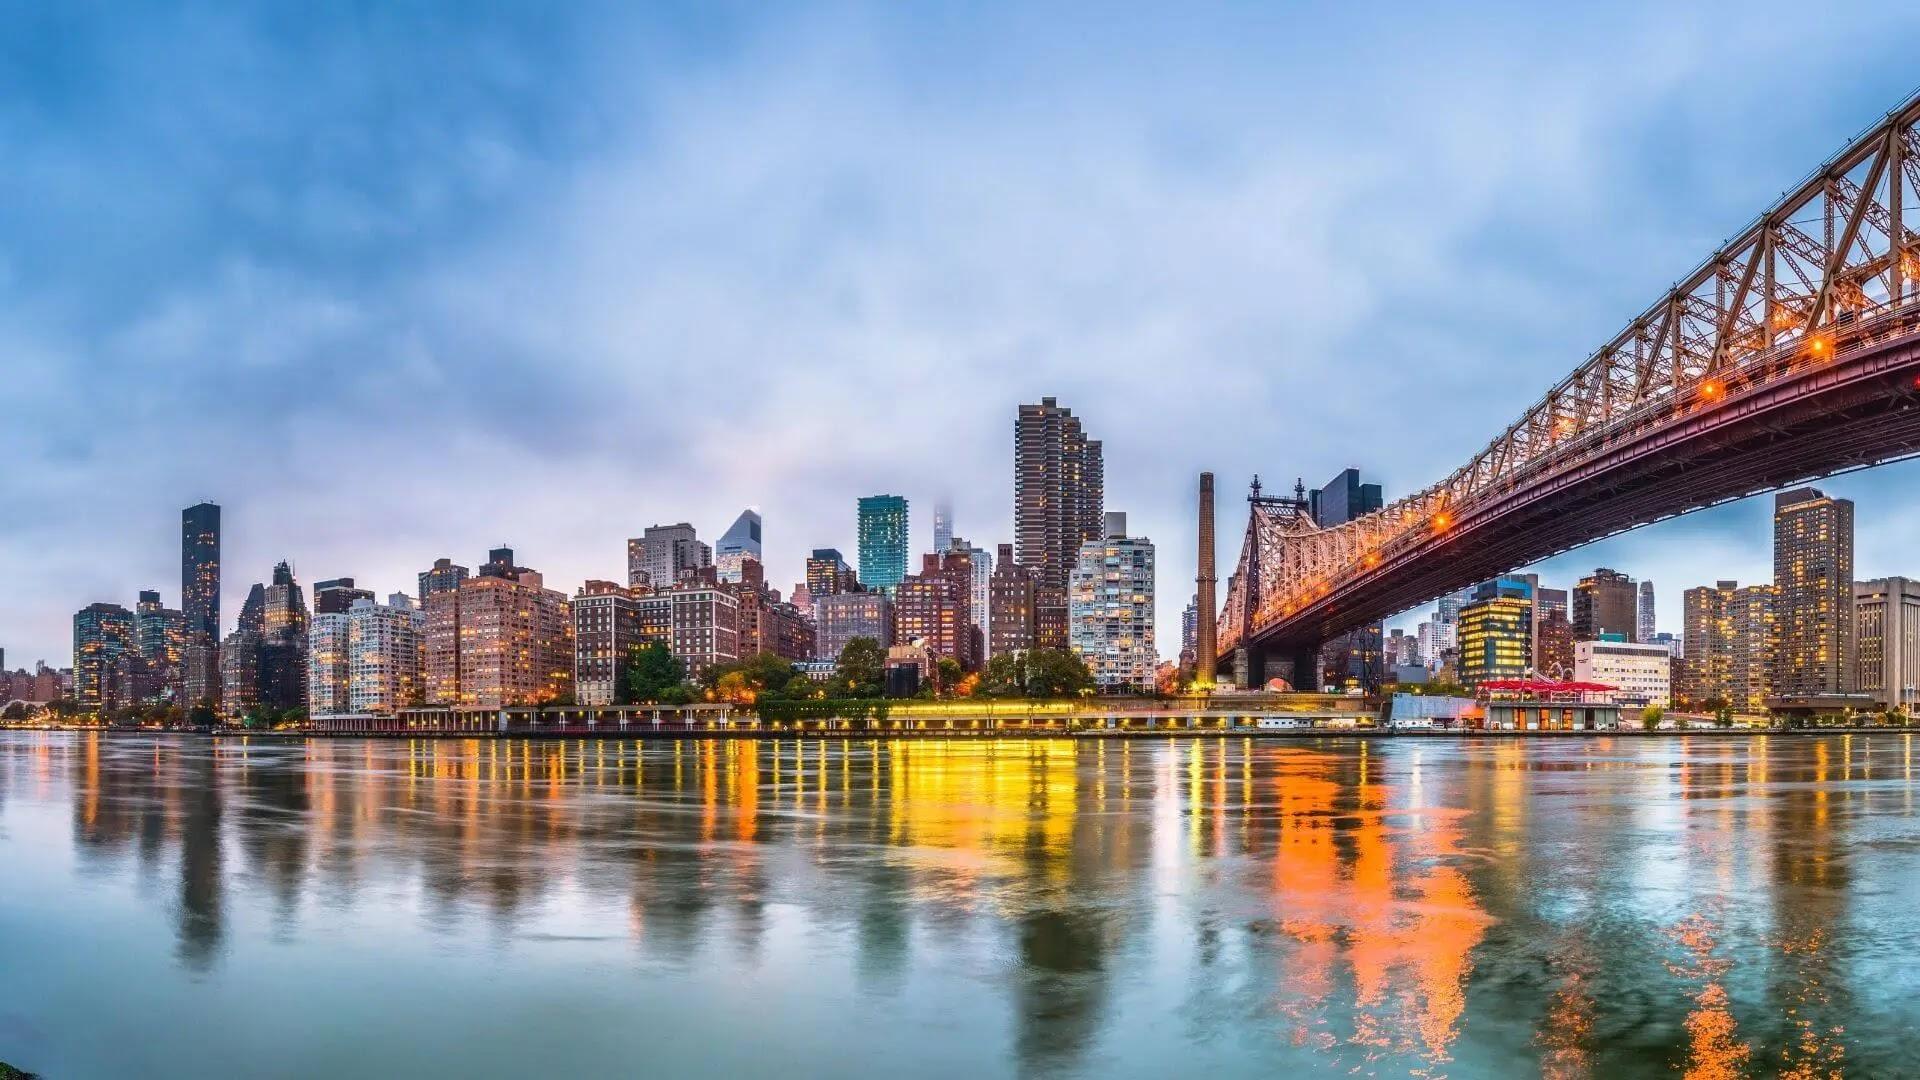 new york city image in full-hd